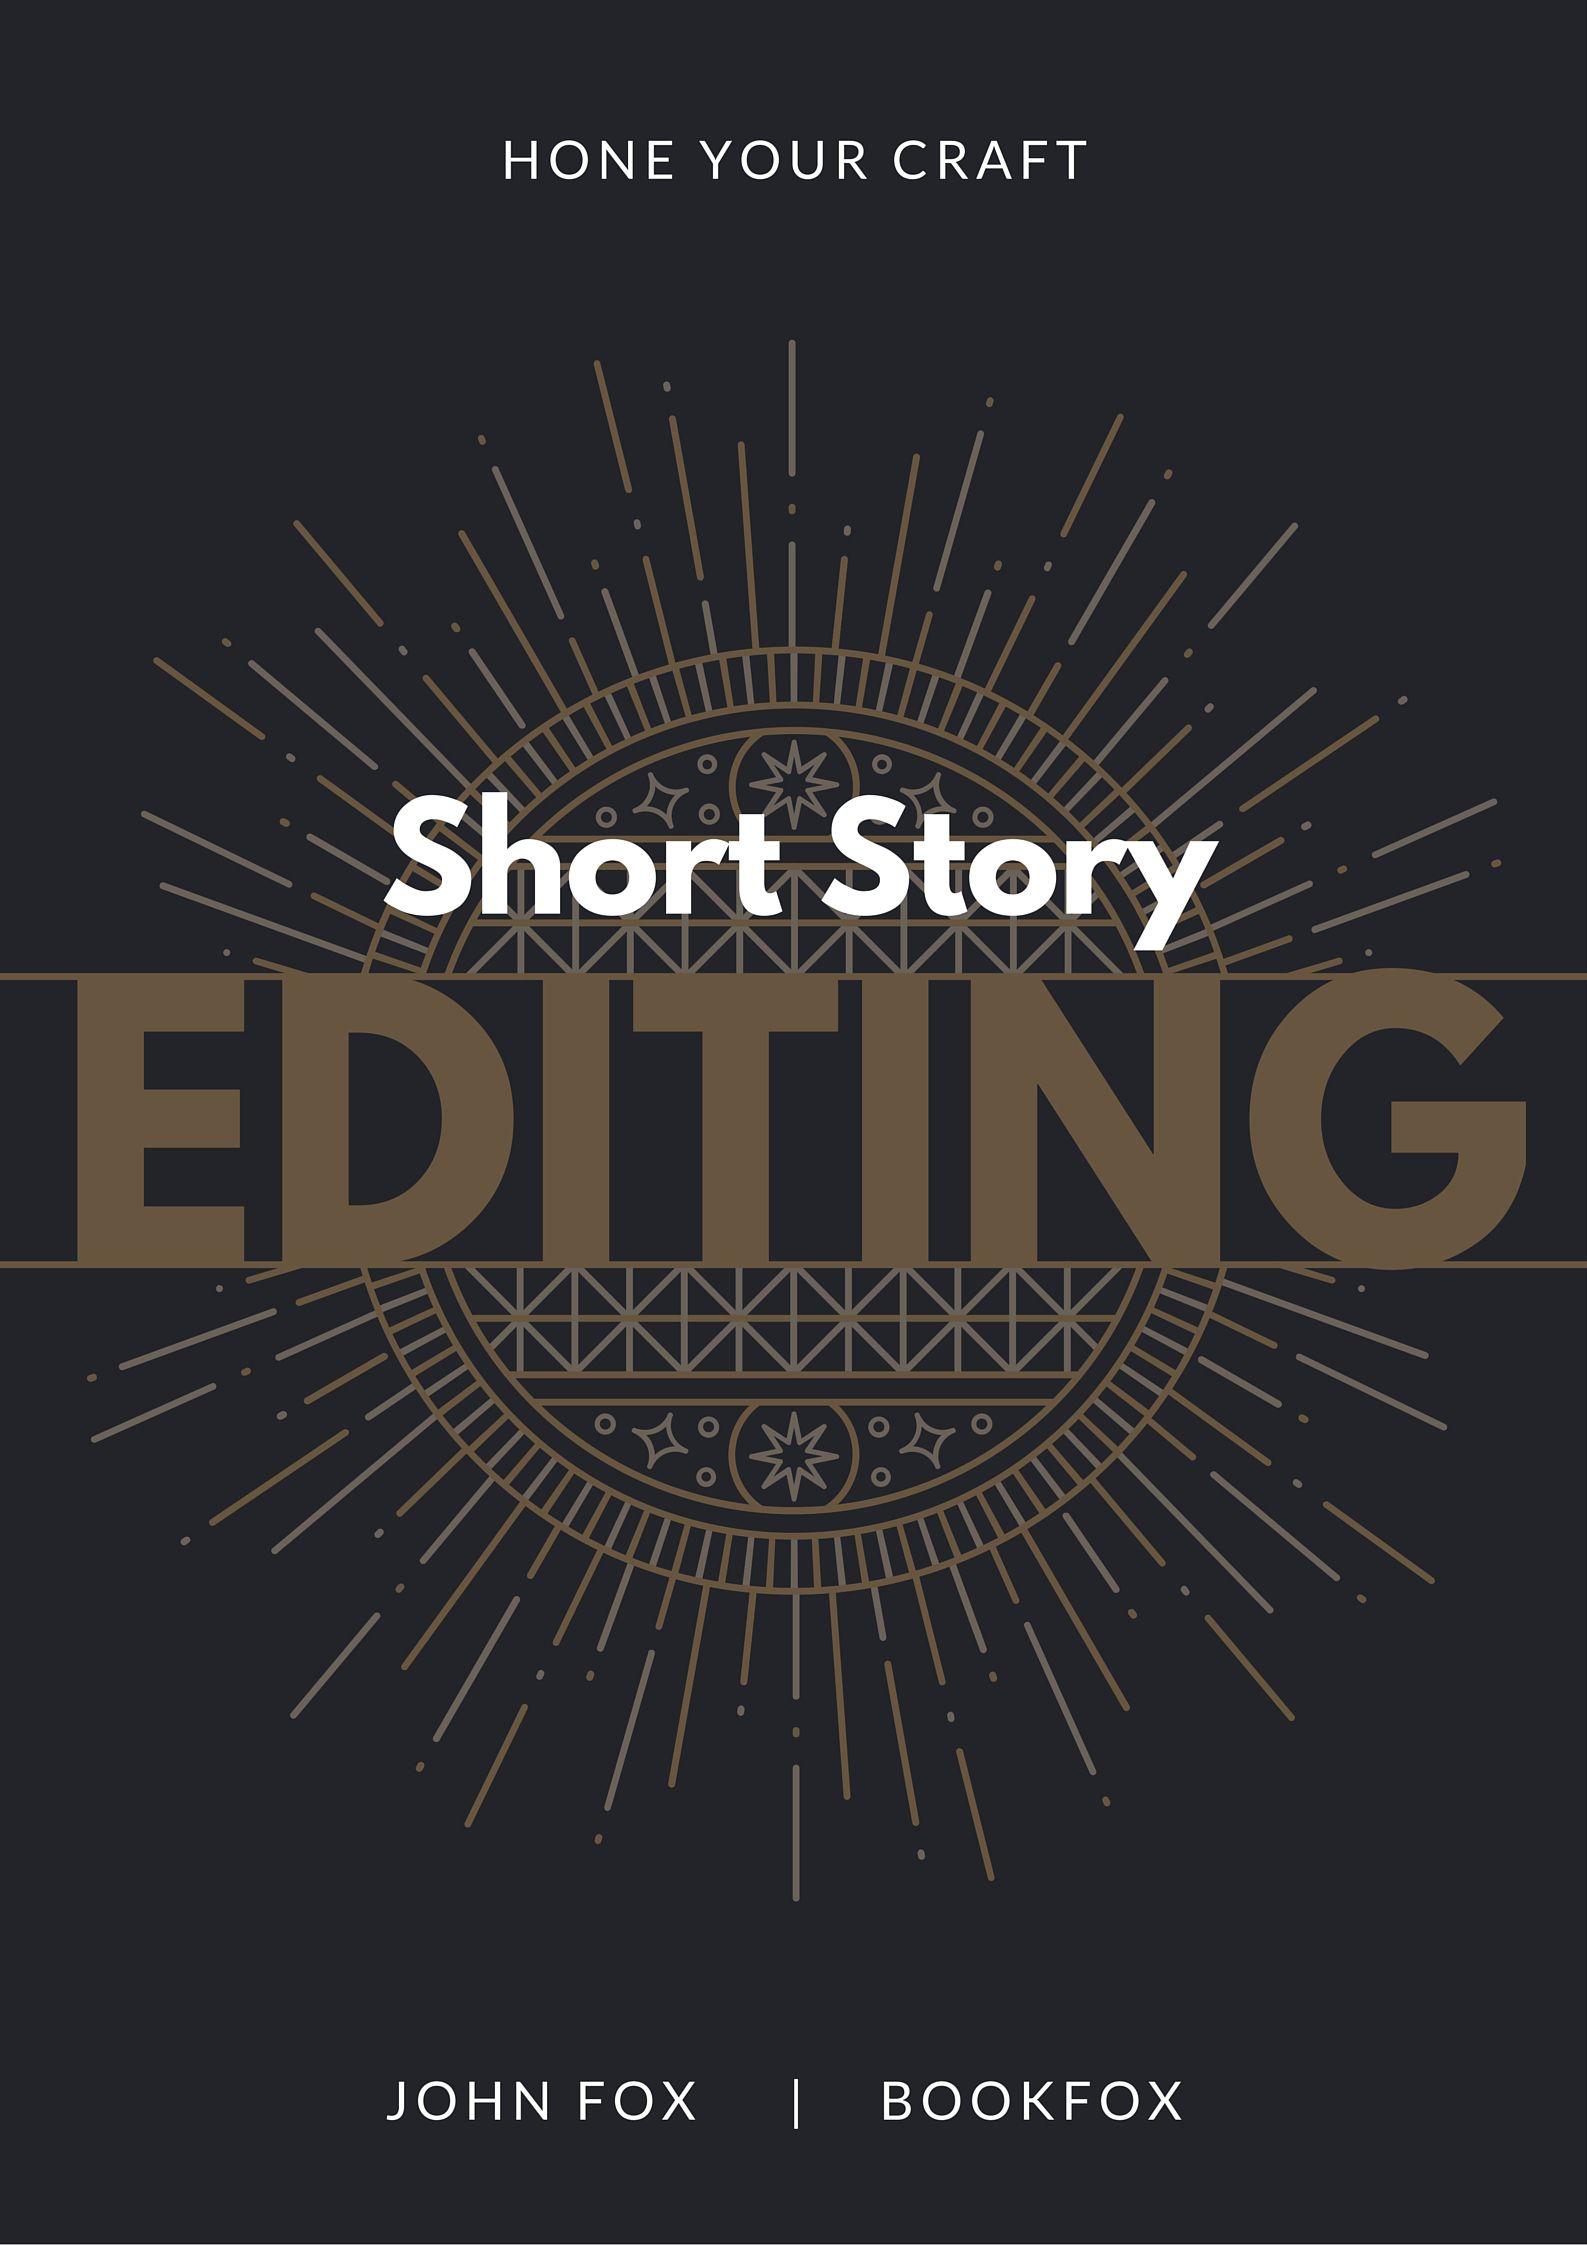 short-story-editing